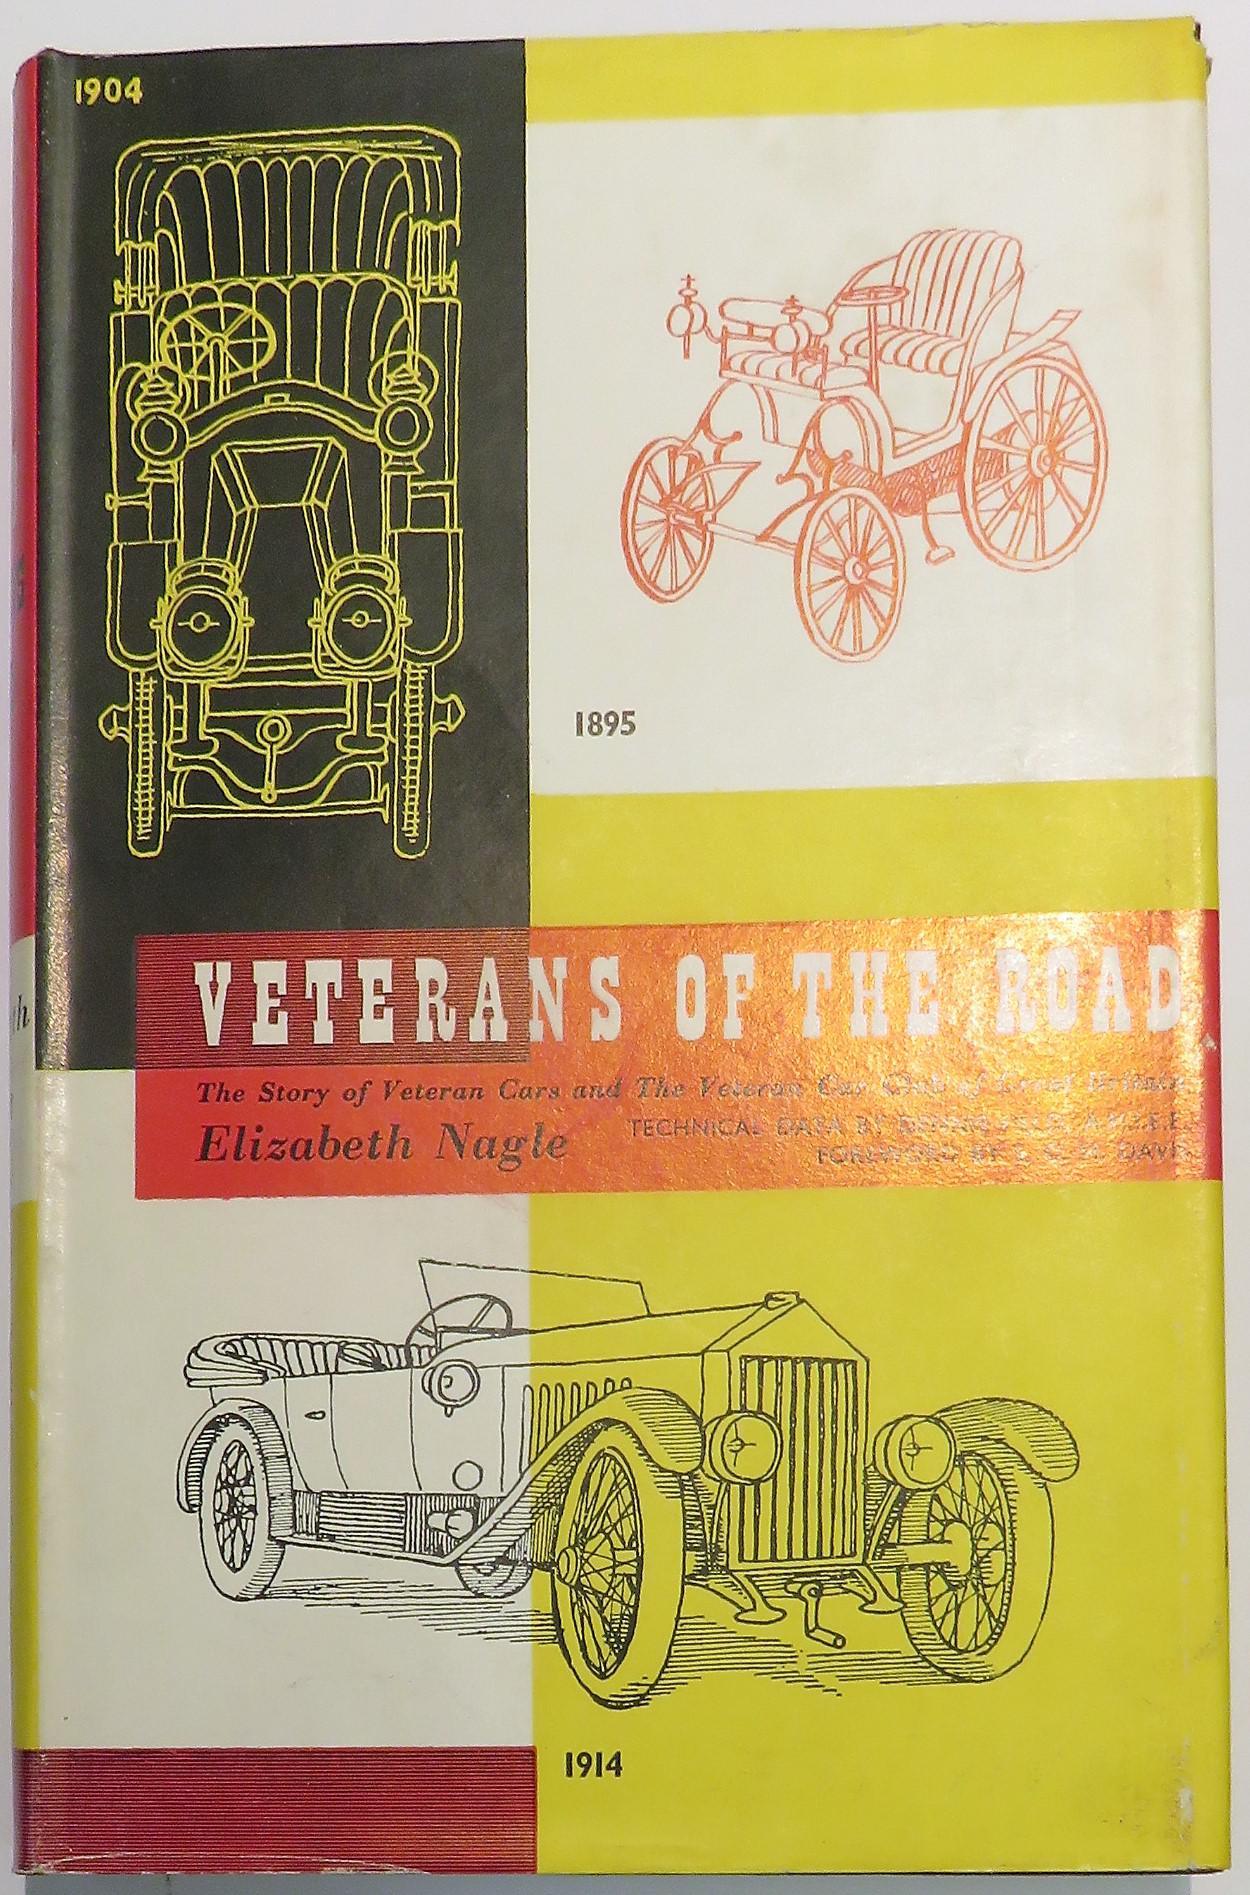 Veterans of the Road